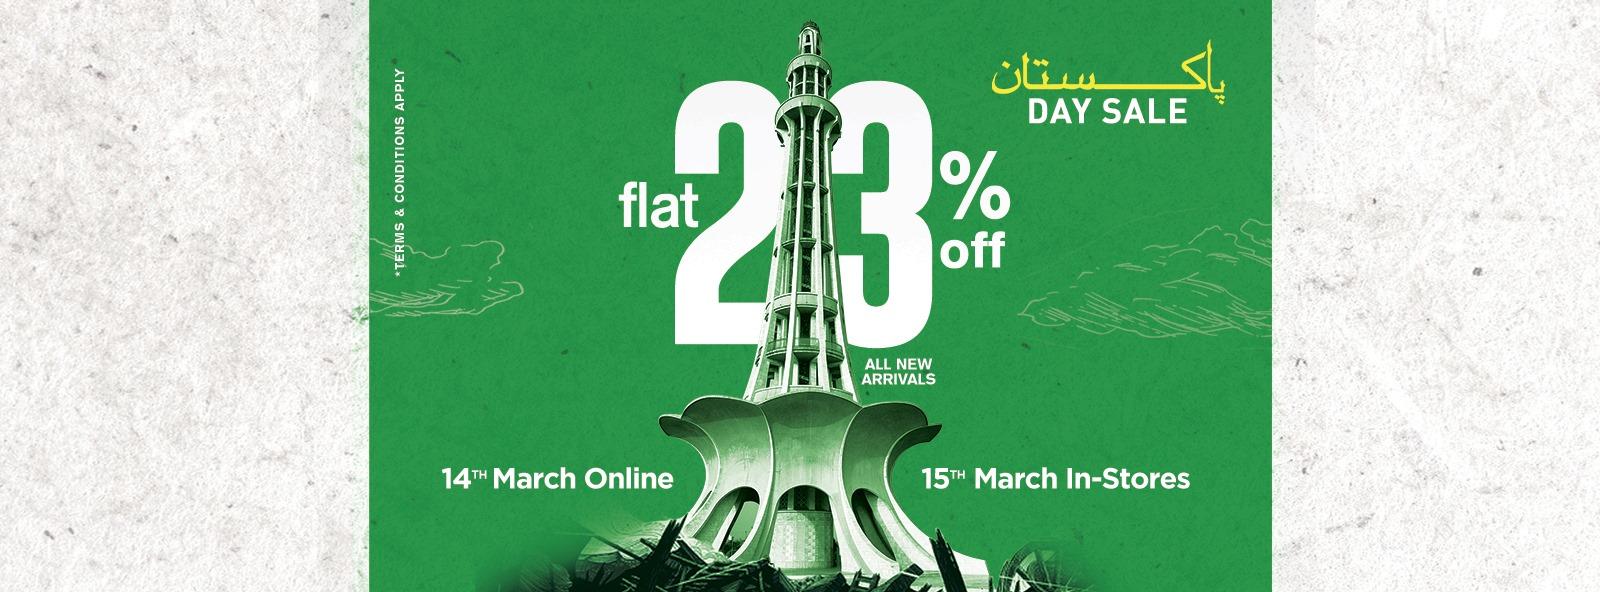 Furor - Pakistan Day Sale